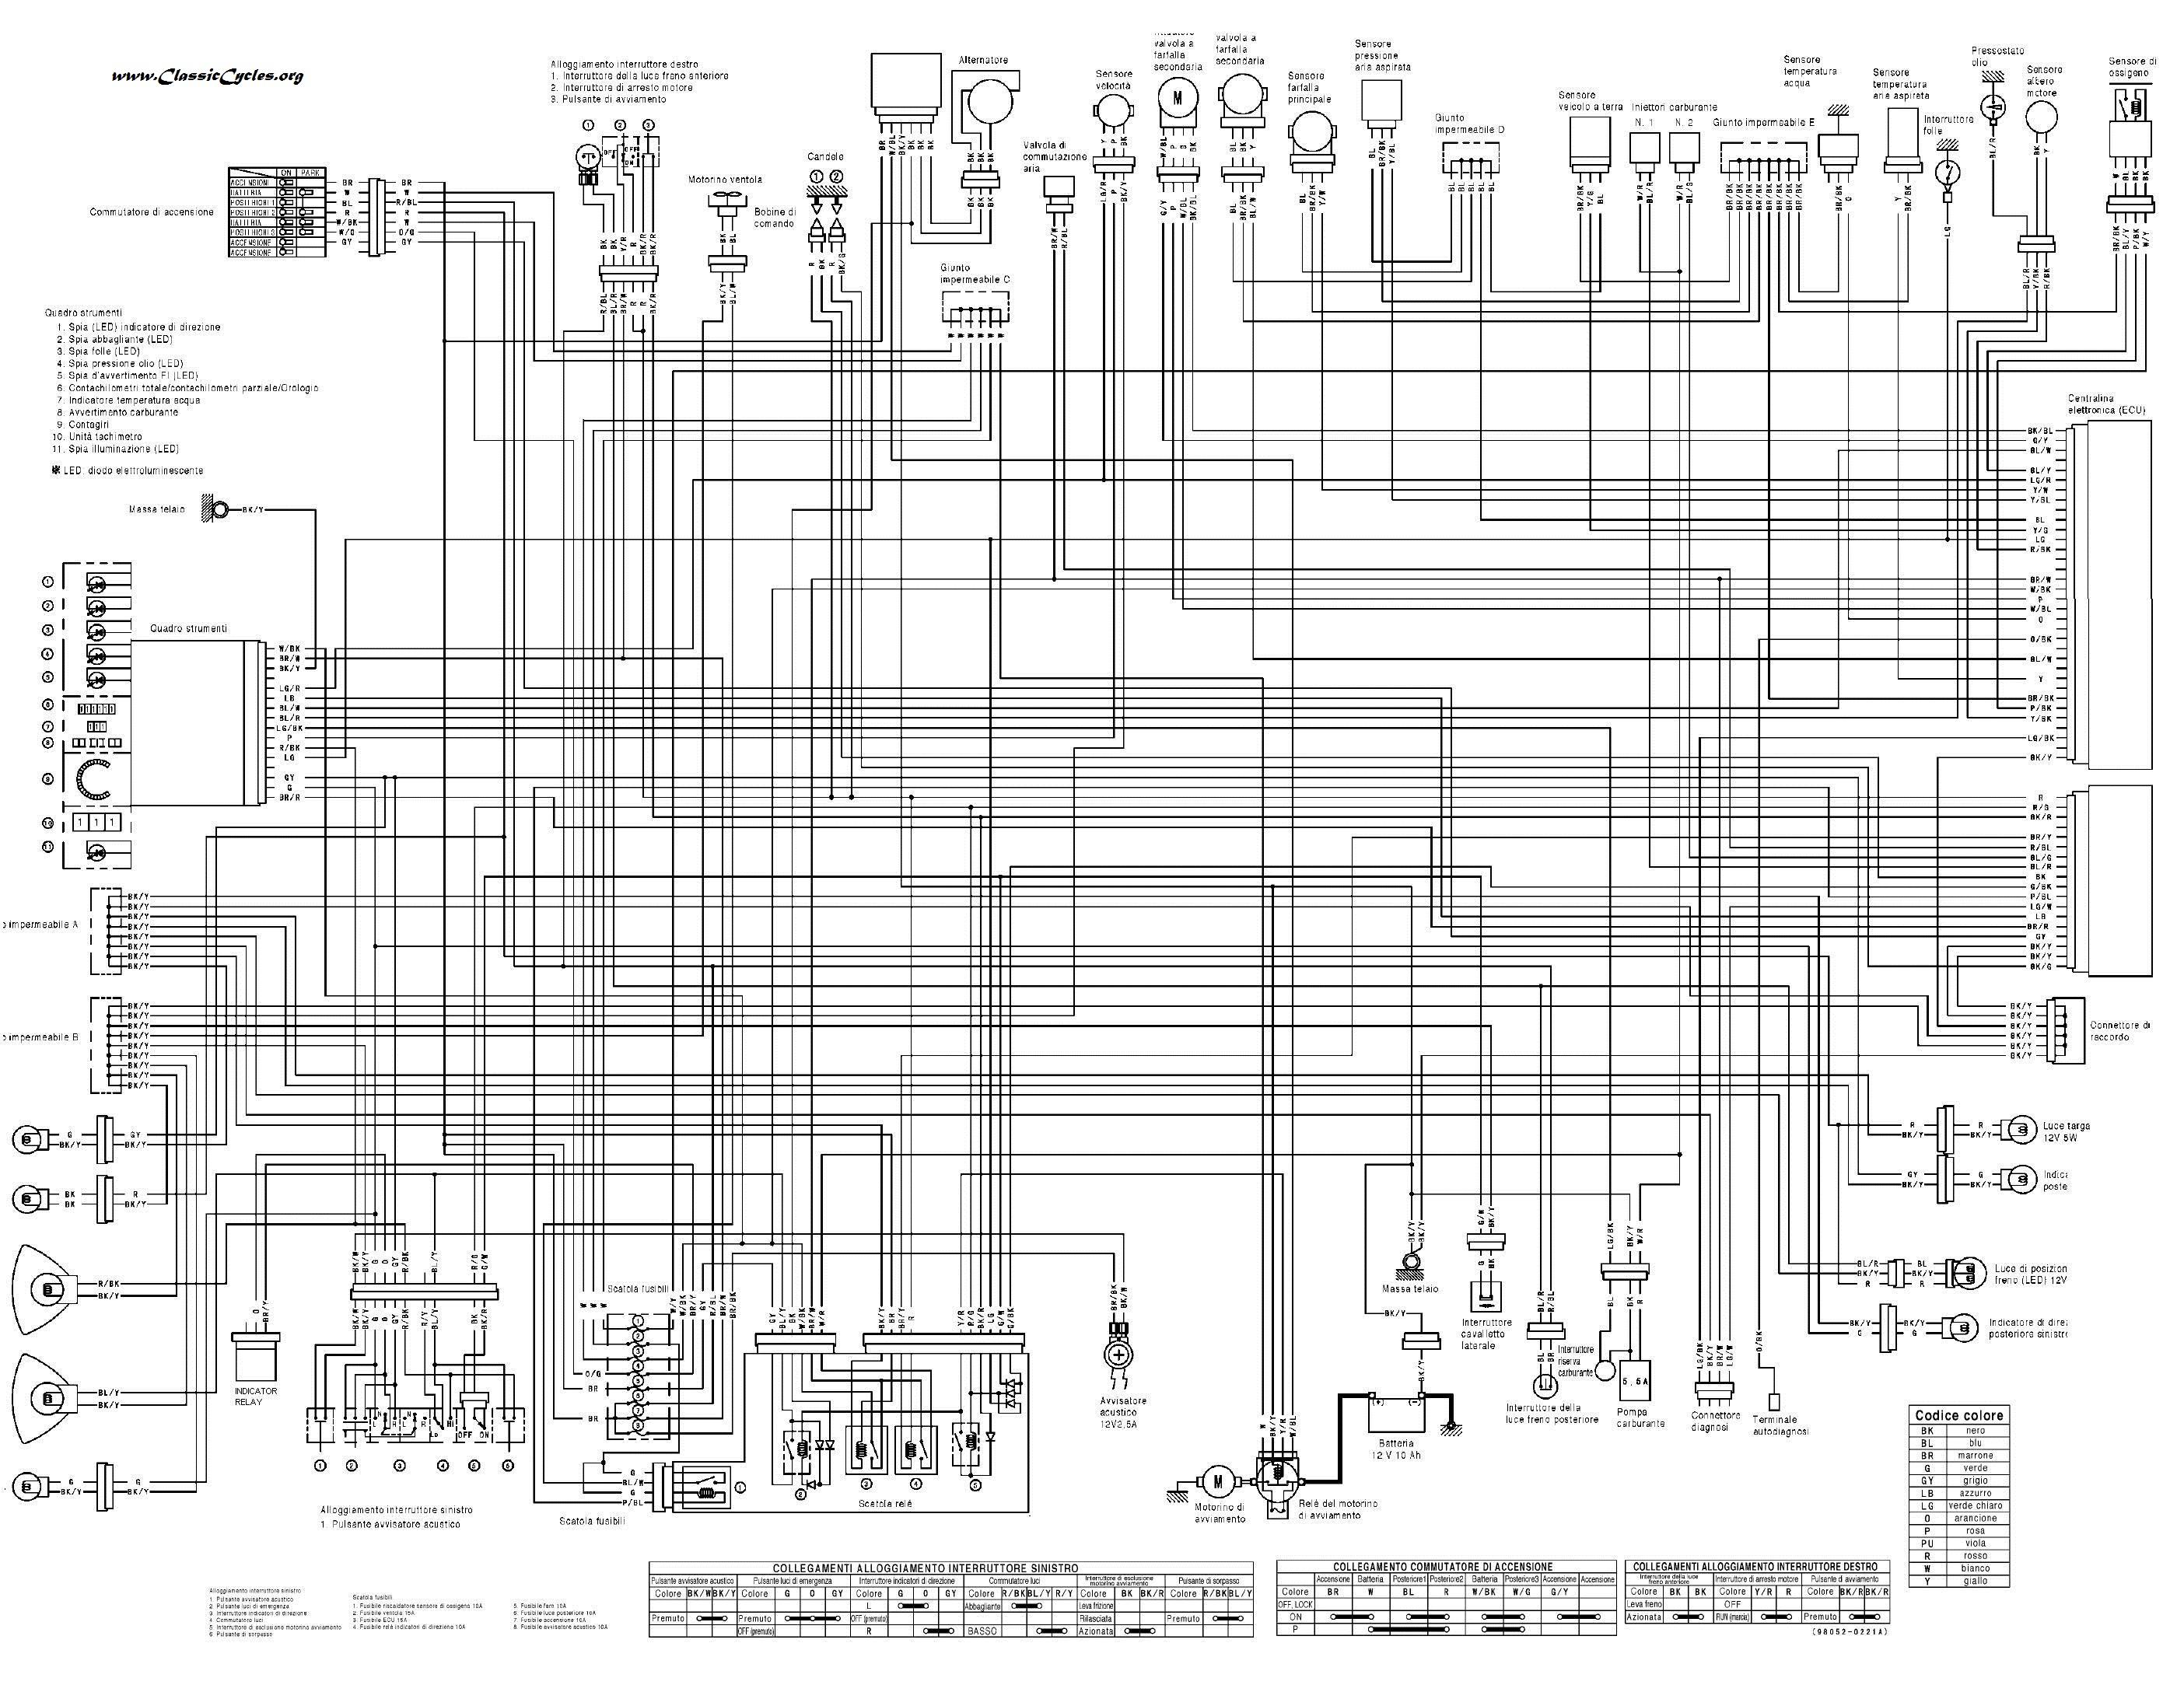 lh_5341] kawasaki ninja zx6r junction box internal circuit download diagram  inrebe hyedi mohammedshrine librar wiring 101